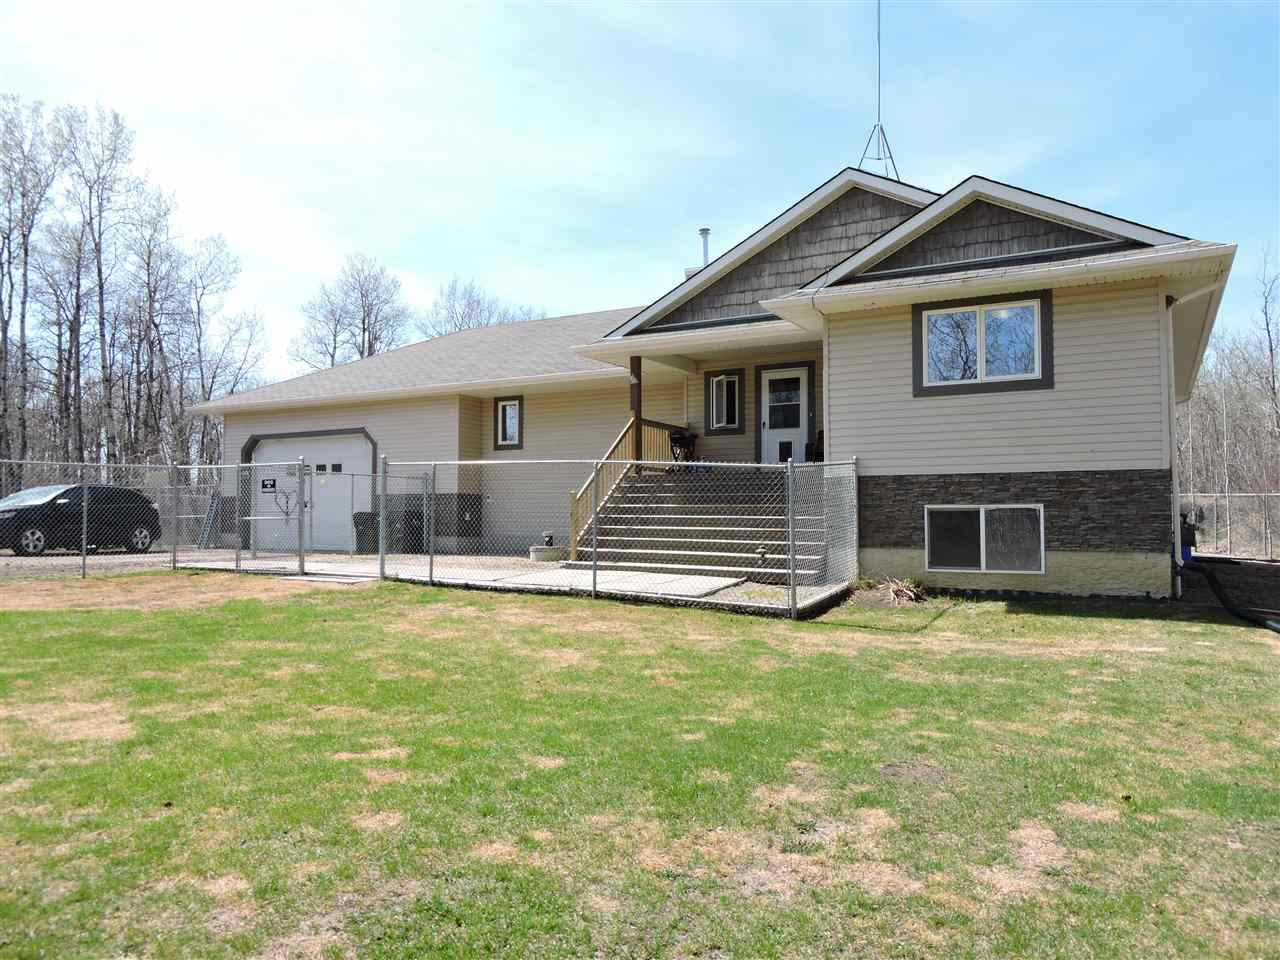 218 52465 Rge Rd 213, Rural Strathcona County, MLS® # E4162518